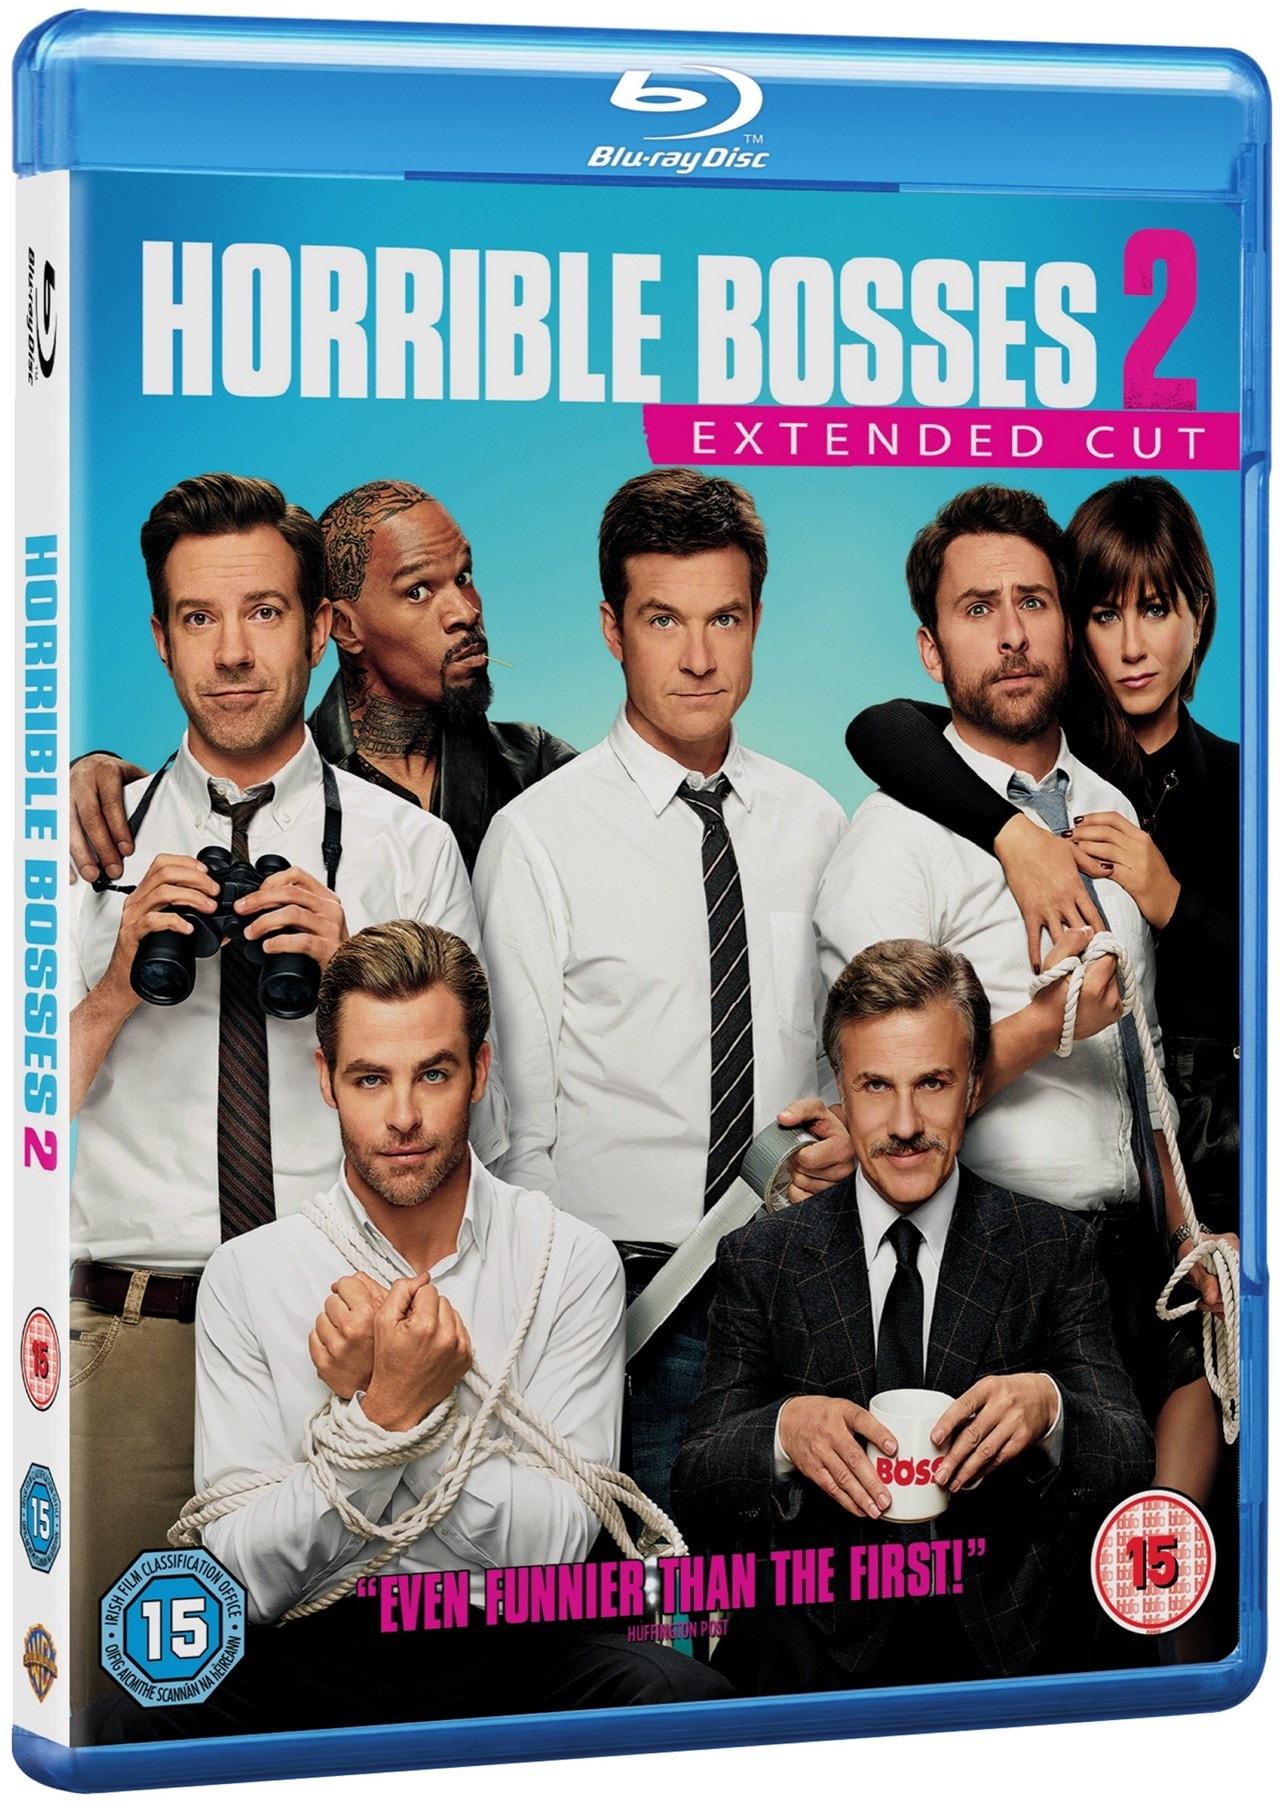 Horrible Bosses 2: Extended Cut - 2